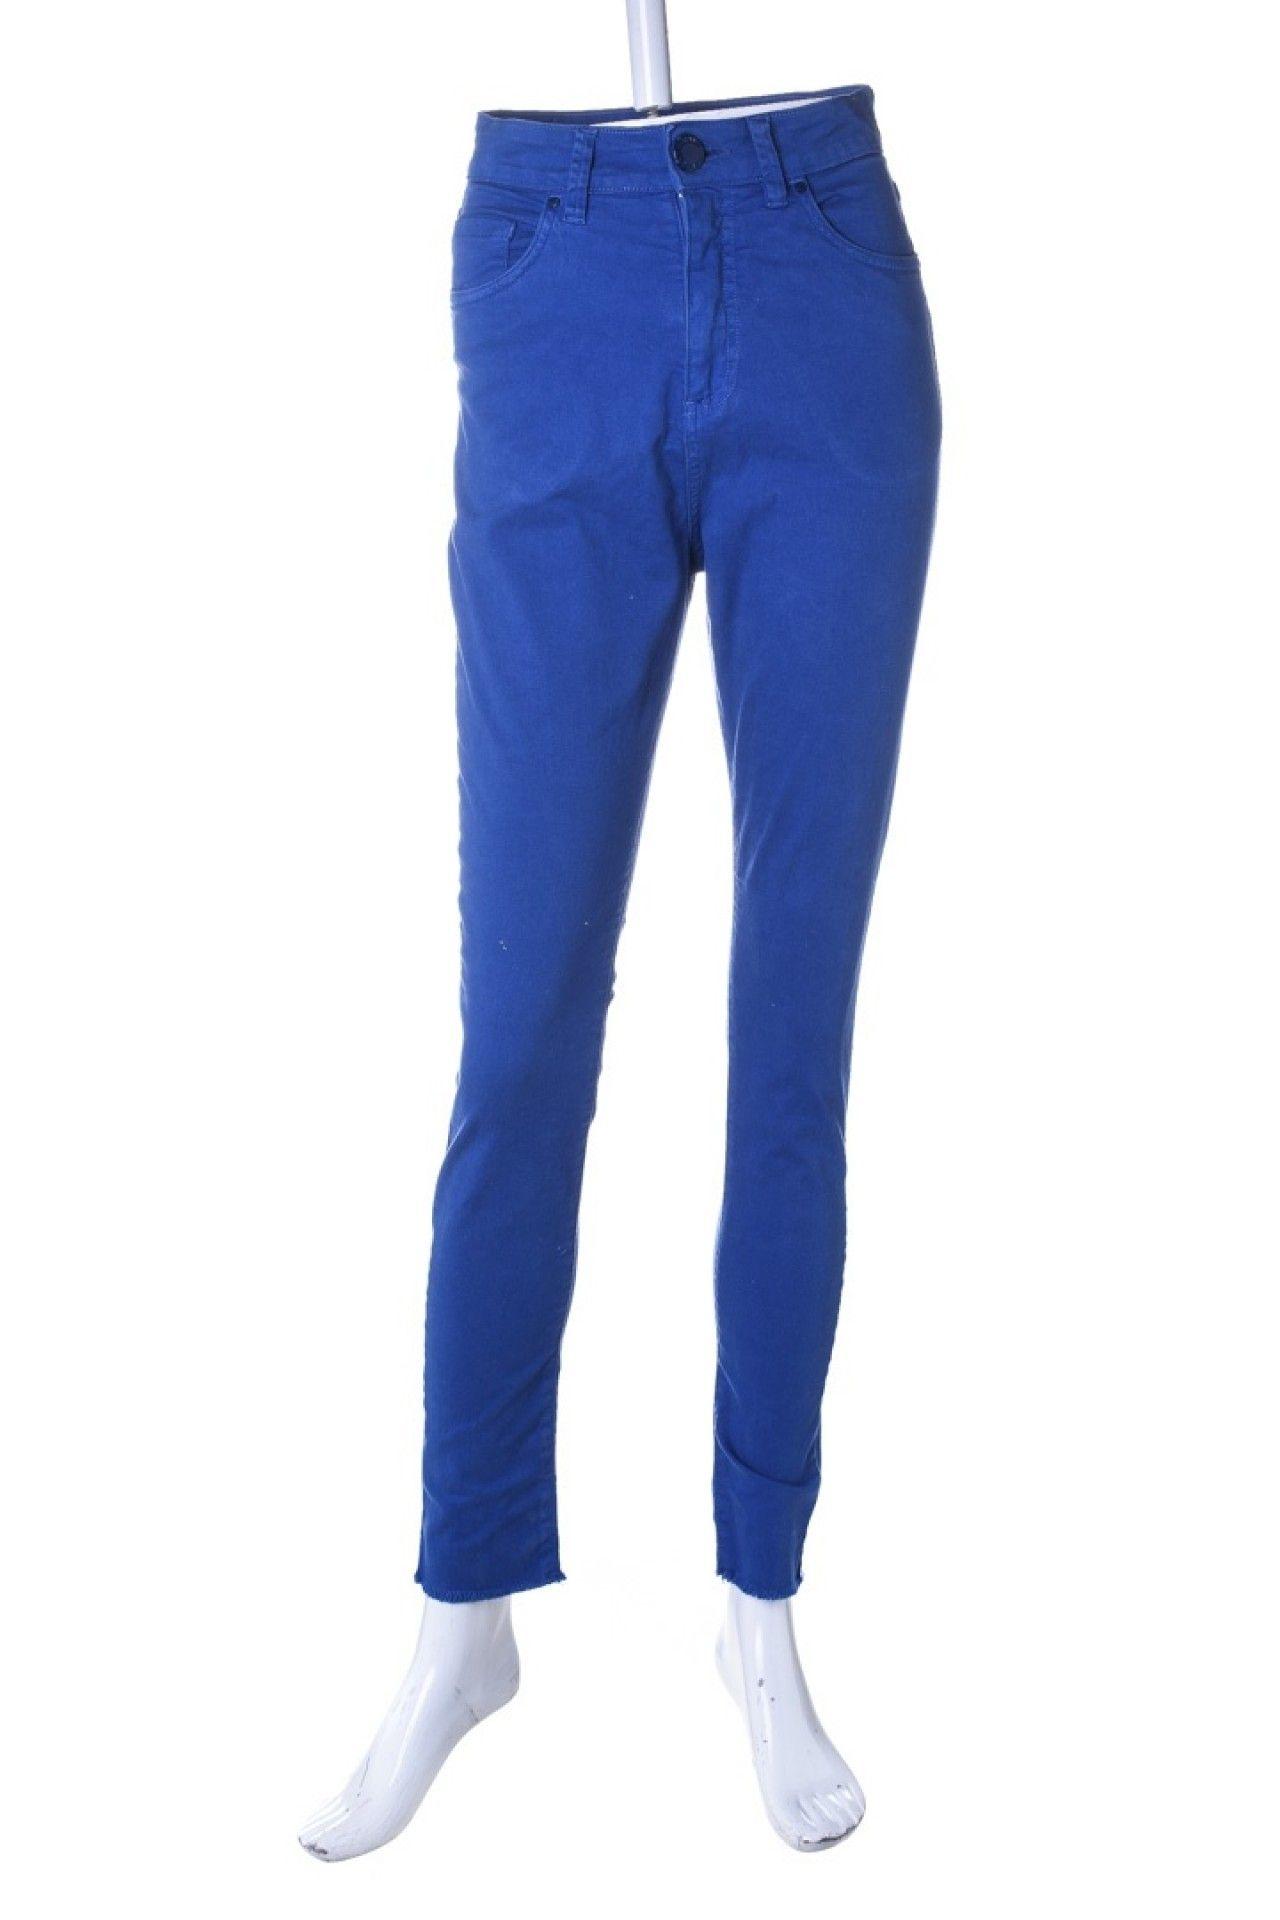 A.brand - Calça Skinny Azul  - Foto 1